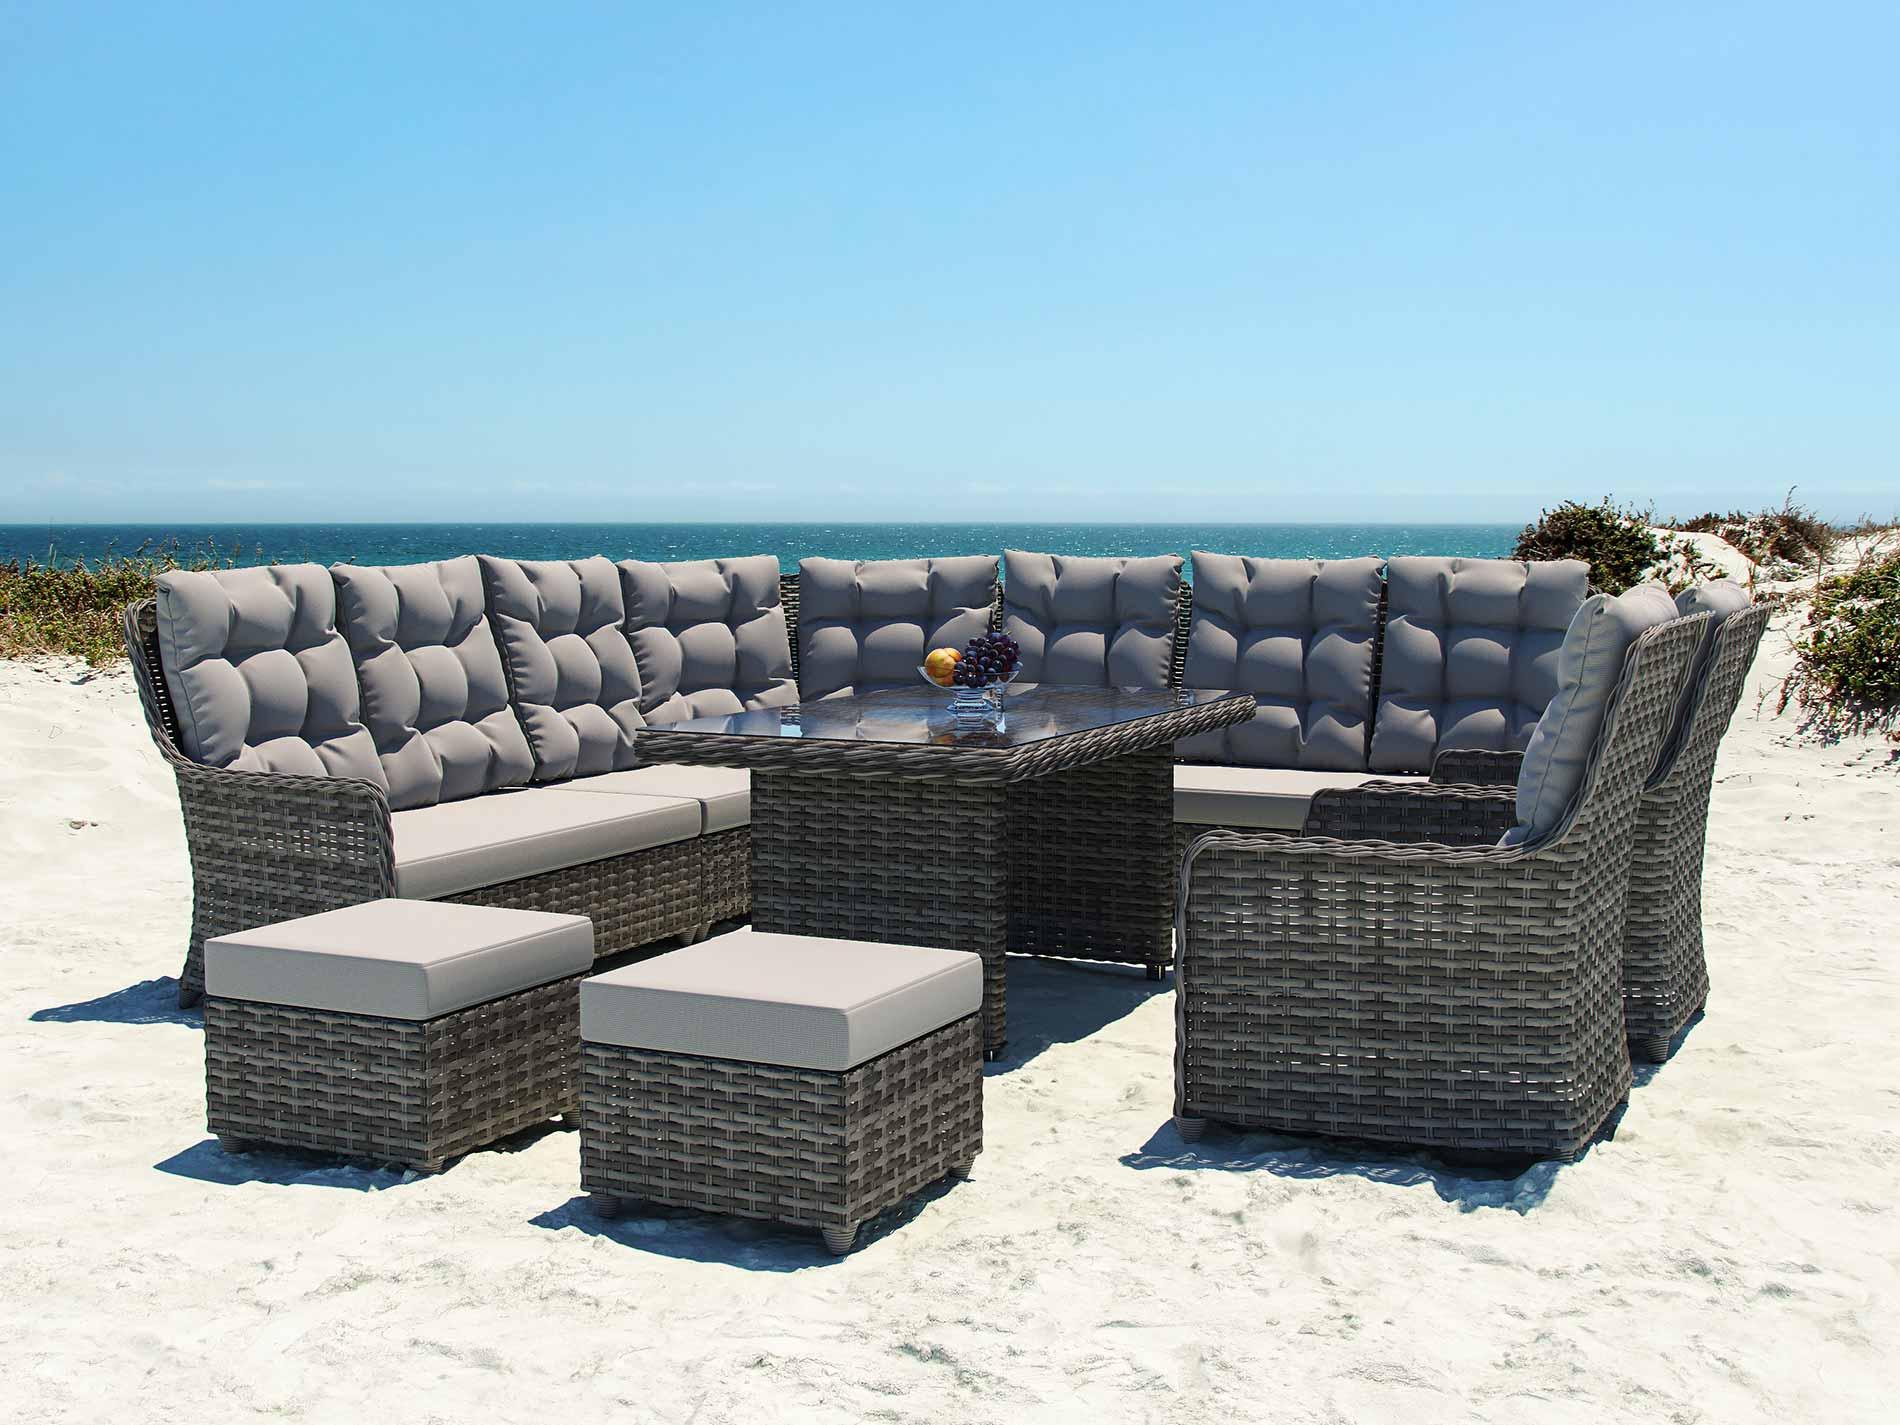 artelia salotto da giardino emma dining m. Black Bedroom Furniture Sets. Home Design Ideas